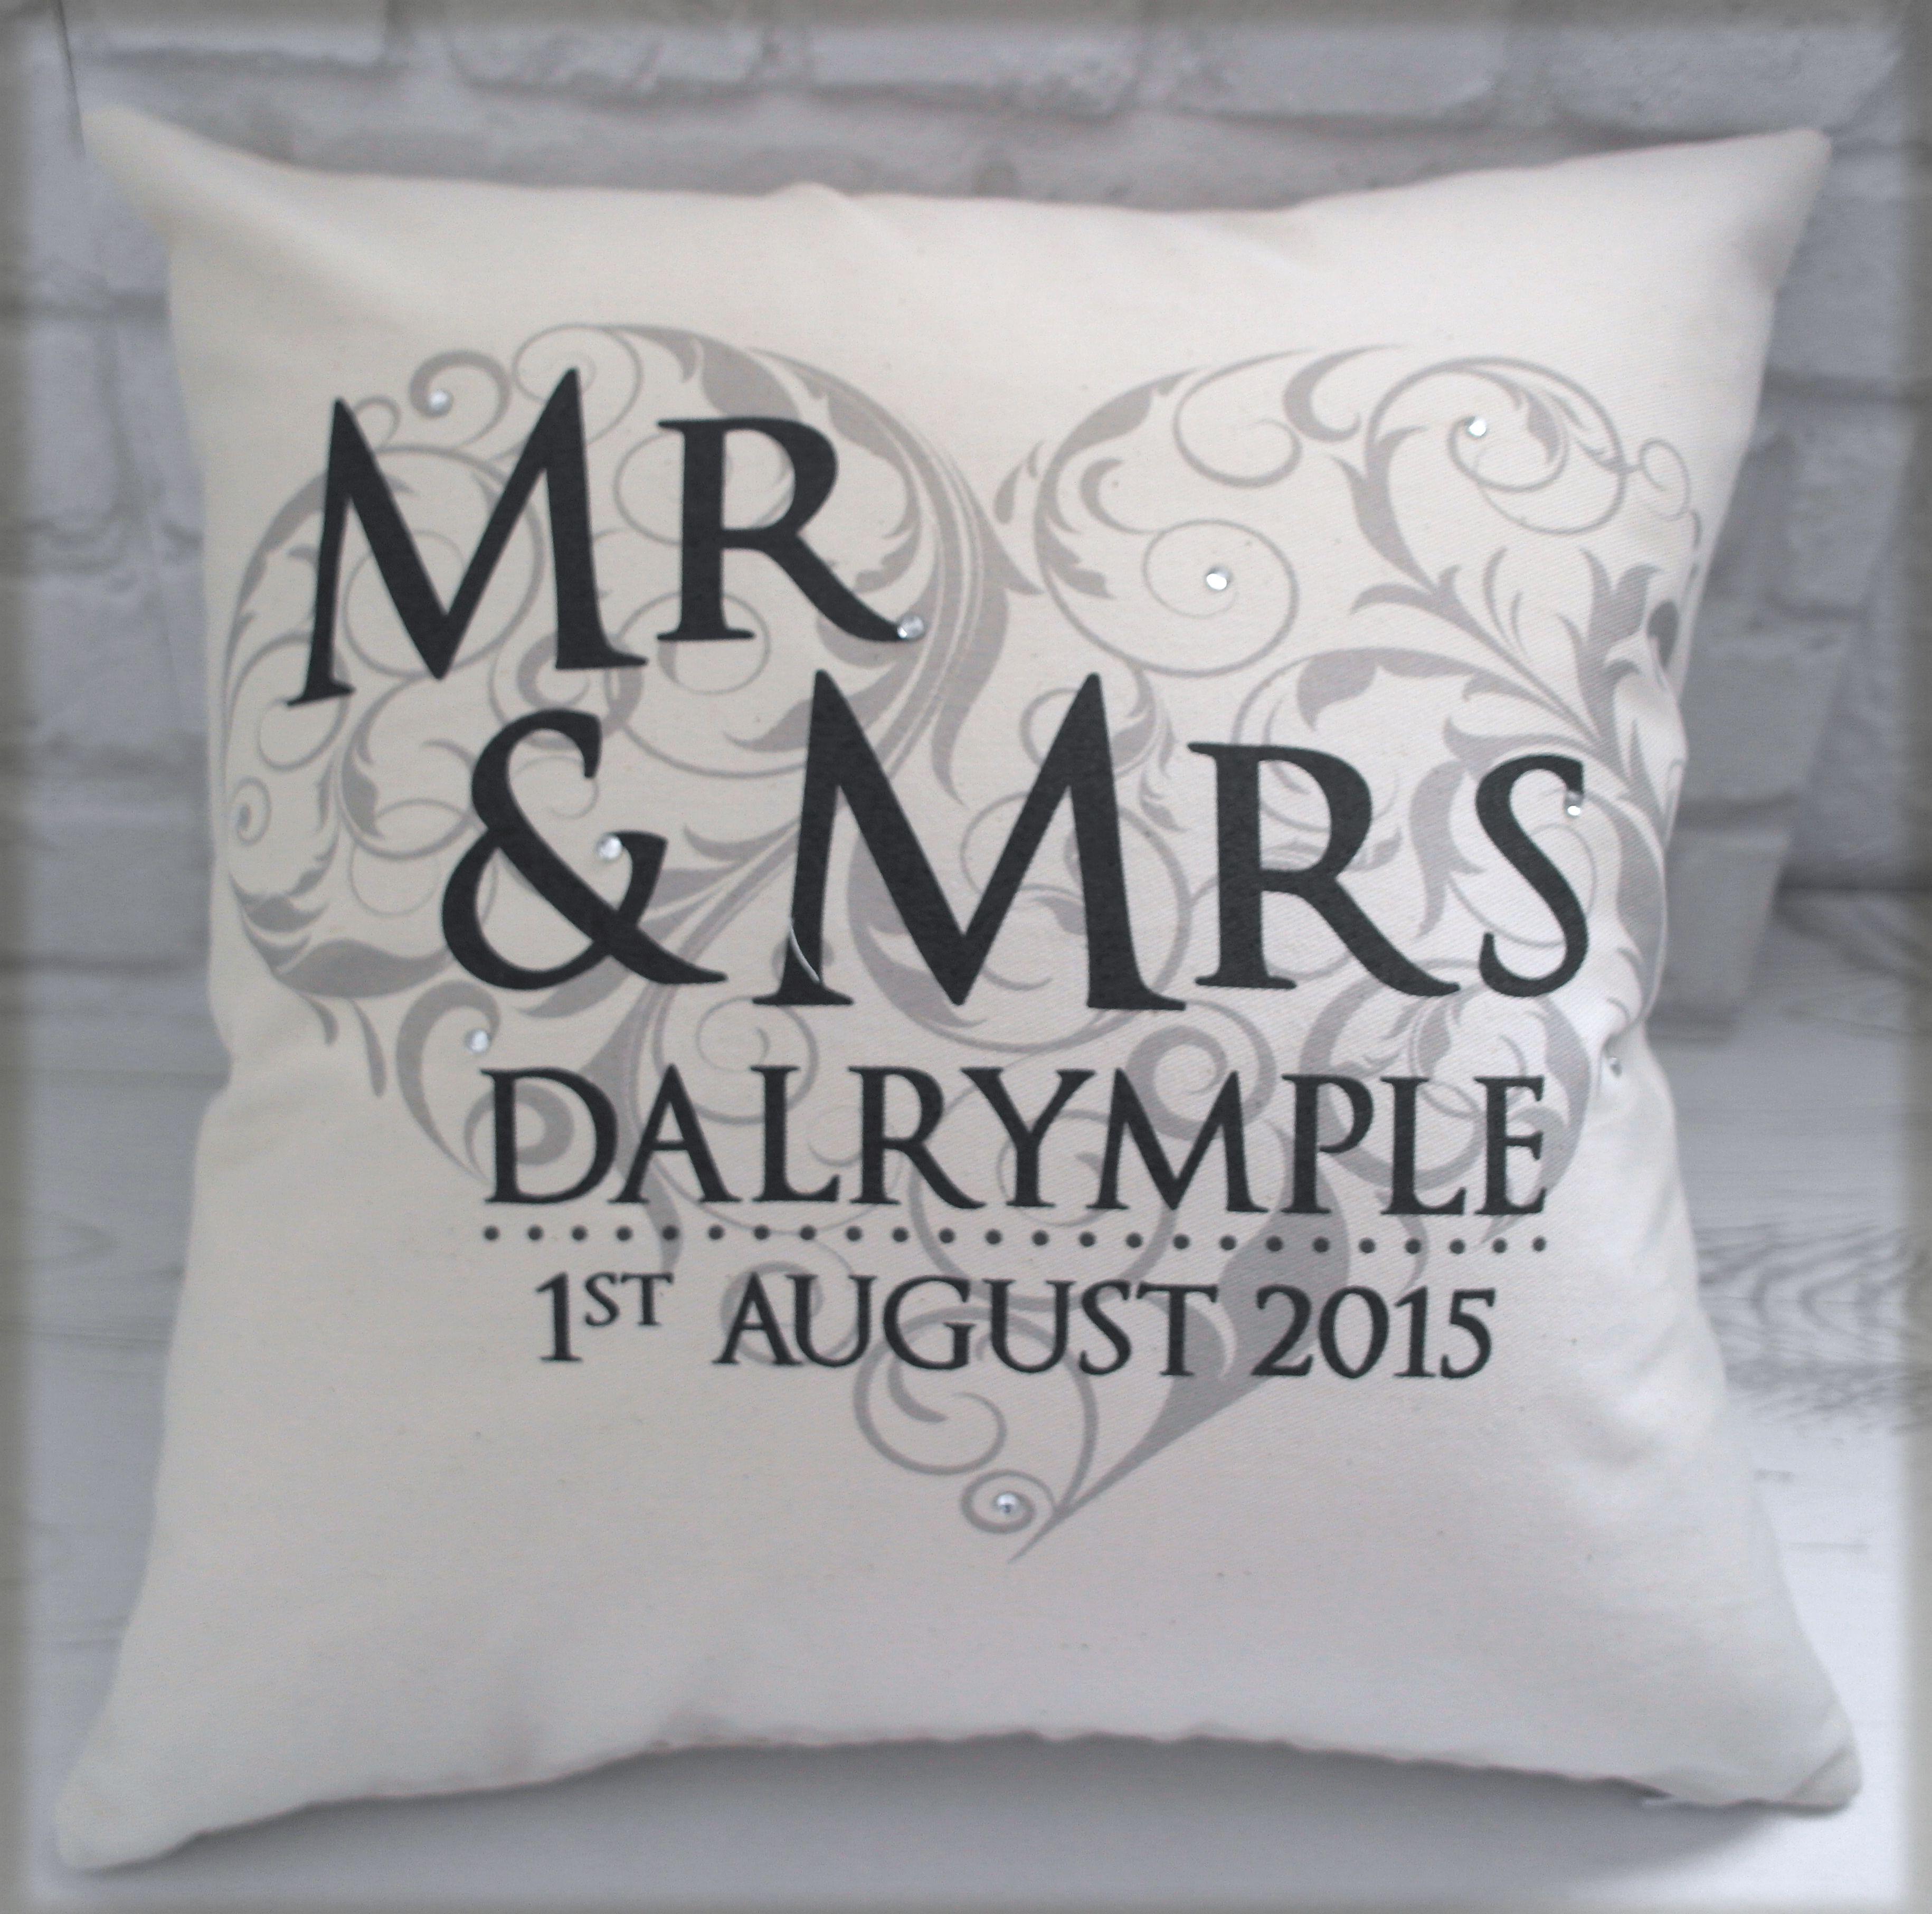 Mr u mrs cushion elegant design which incorporates the couples